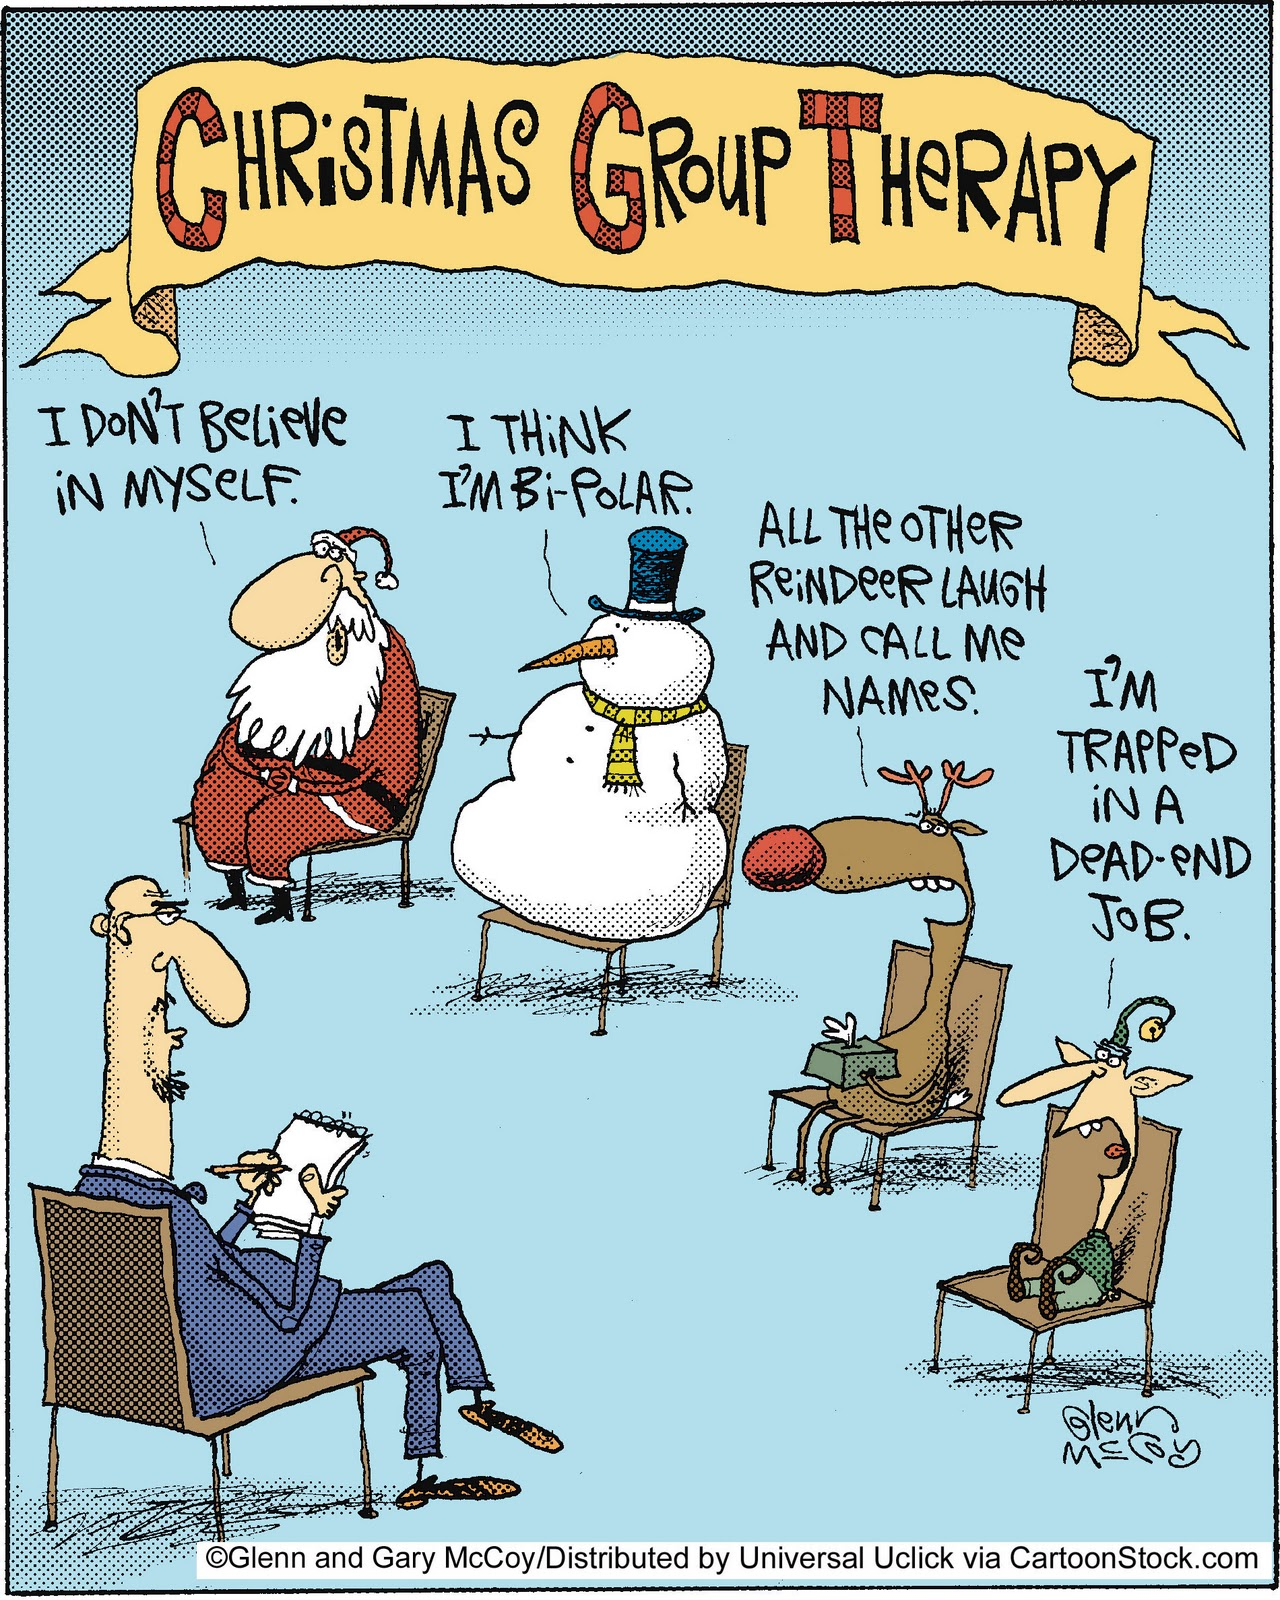 GiantSantasAteMyReindeerGerald: Christmas Cartoon Fun 2 Pictures Gallery